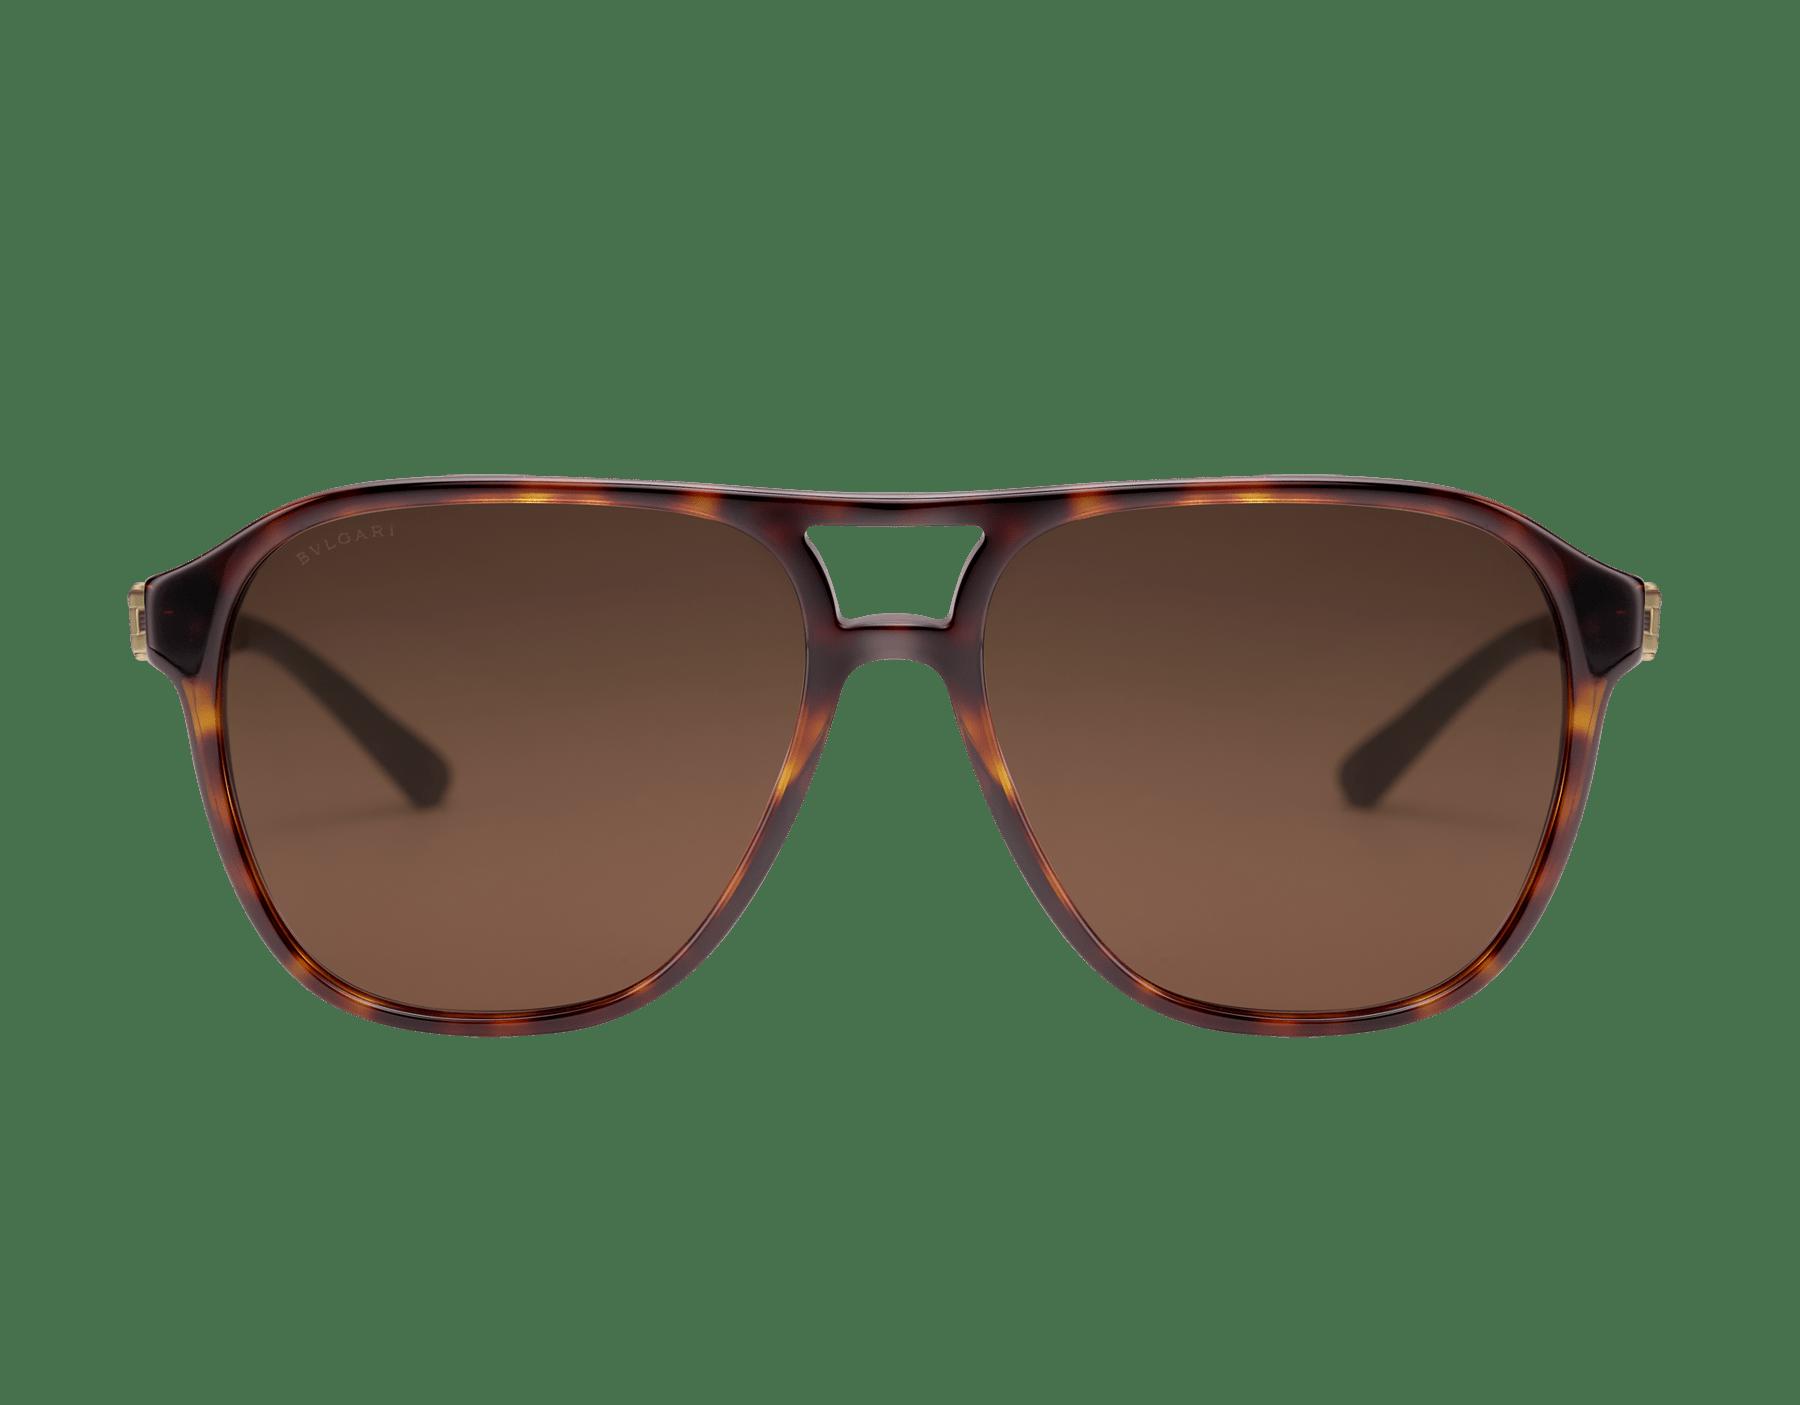 Bvlgari Diagono acetate aviator sunglasses. 903830 image 2